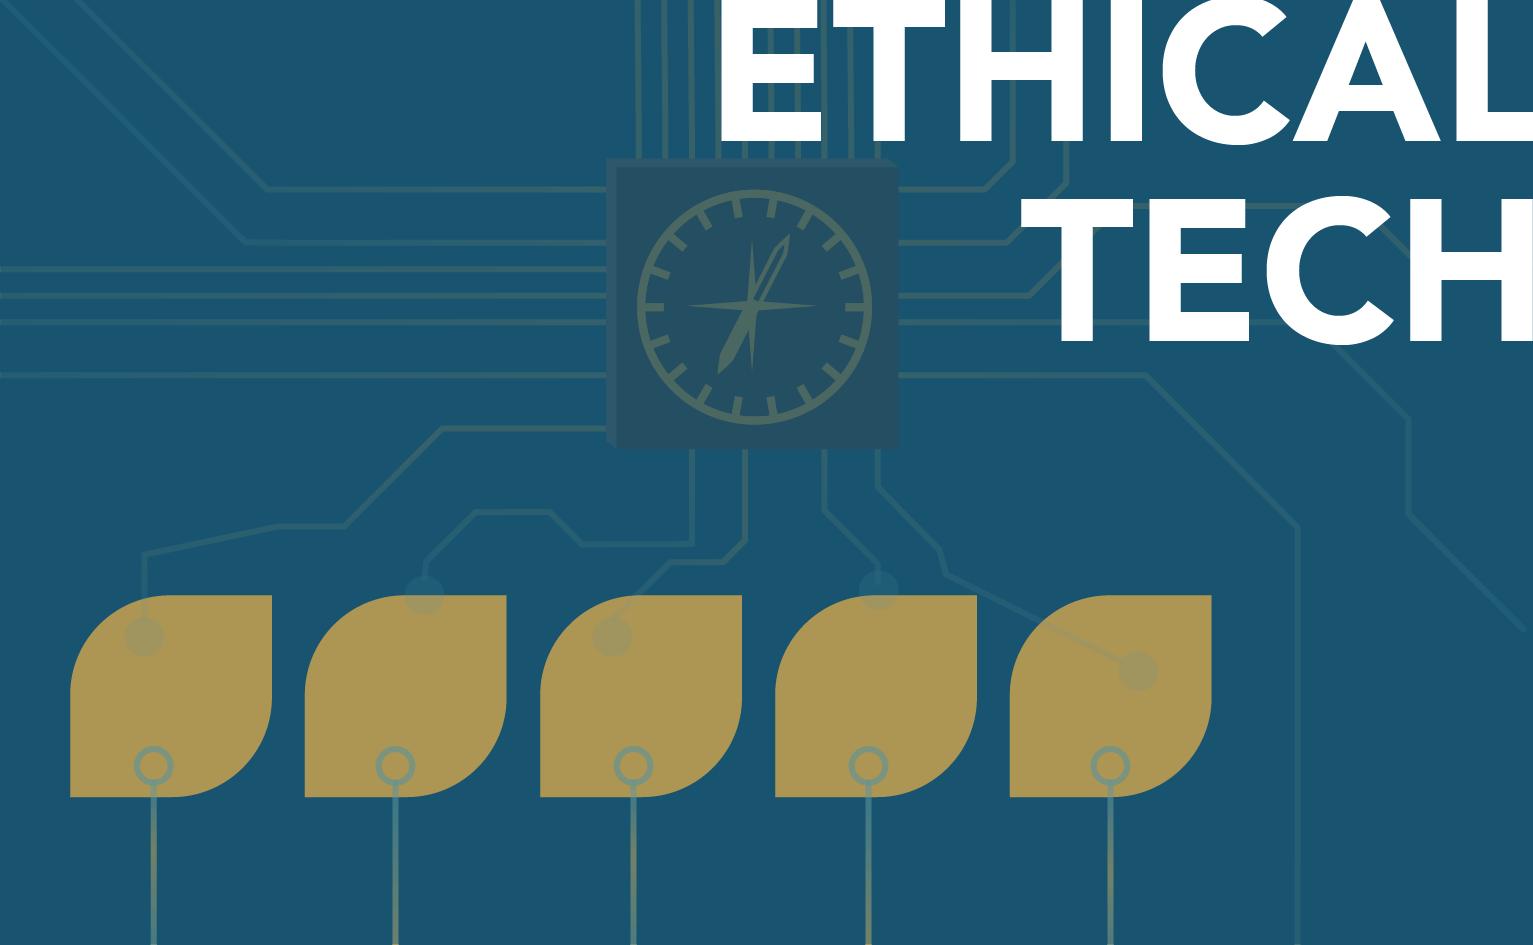 Decorative tile for Ethical Tech program